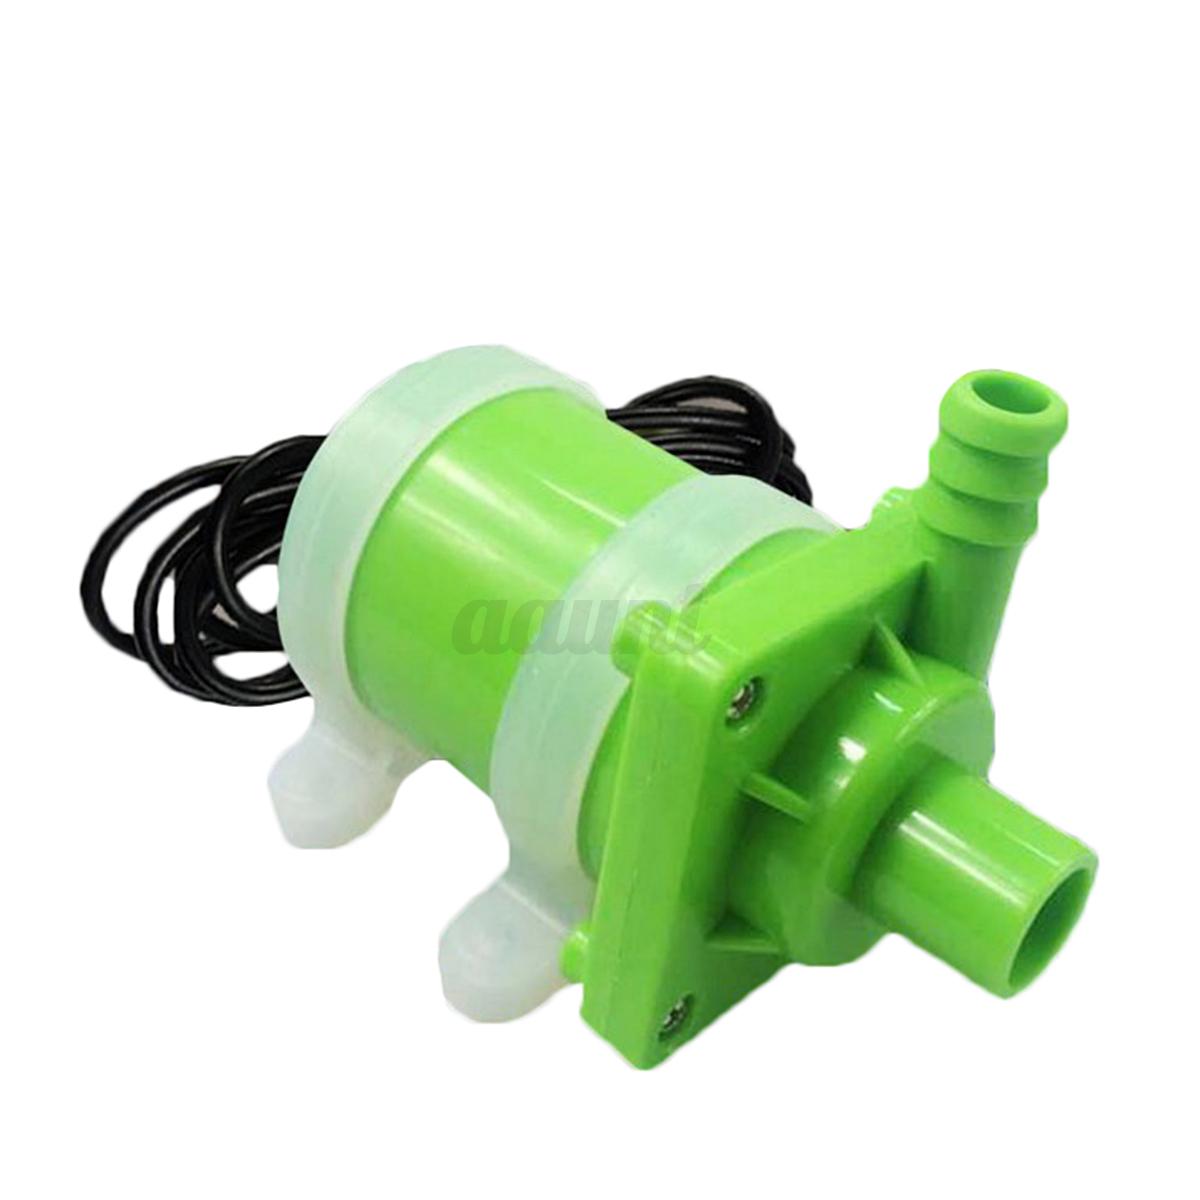 Dc 12 24v submersible aquarium oxygen pump pond fish tank for Fish tank oxygen pump